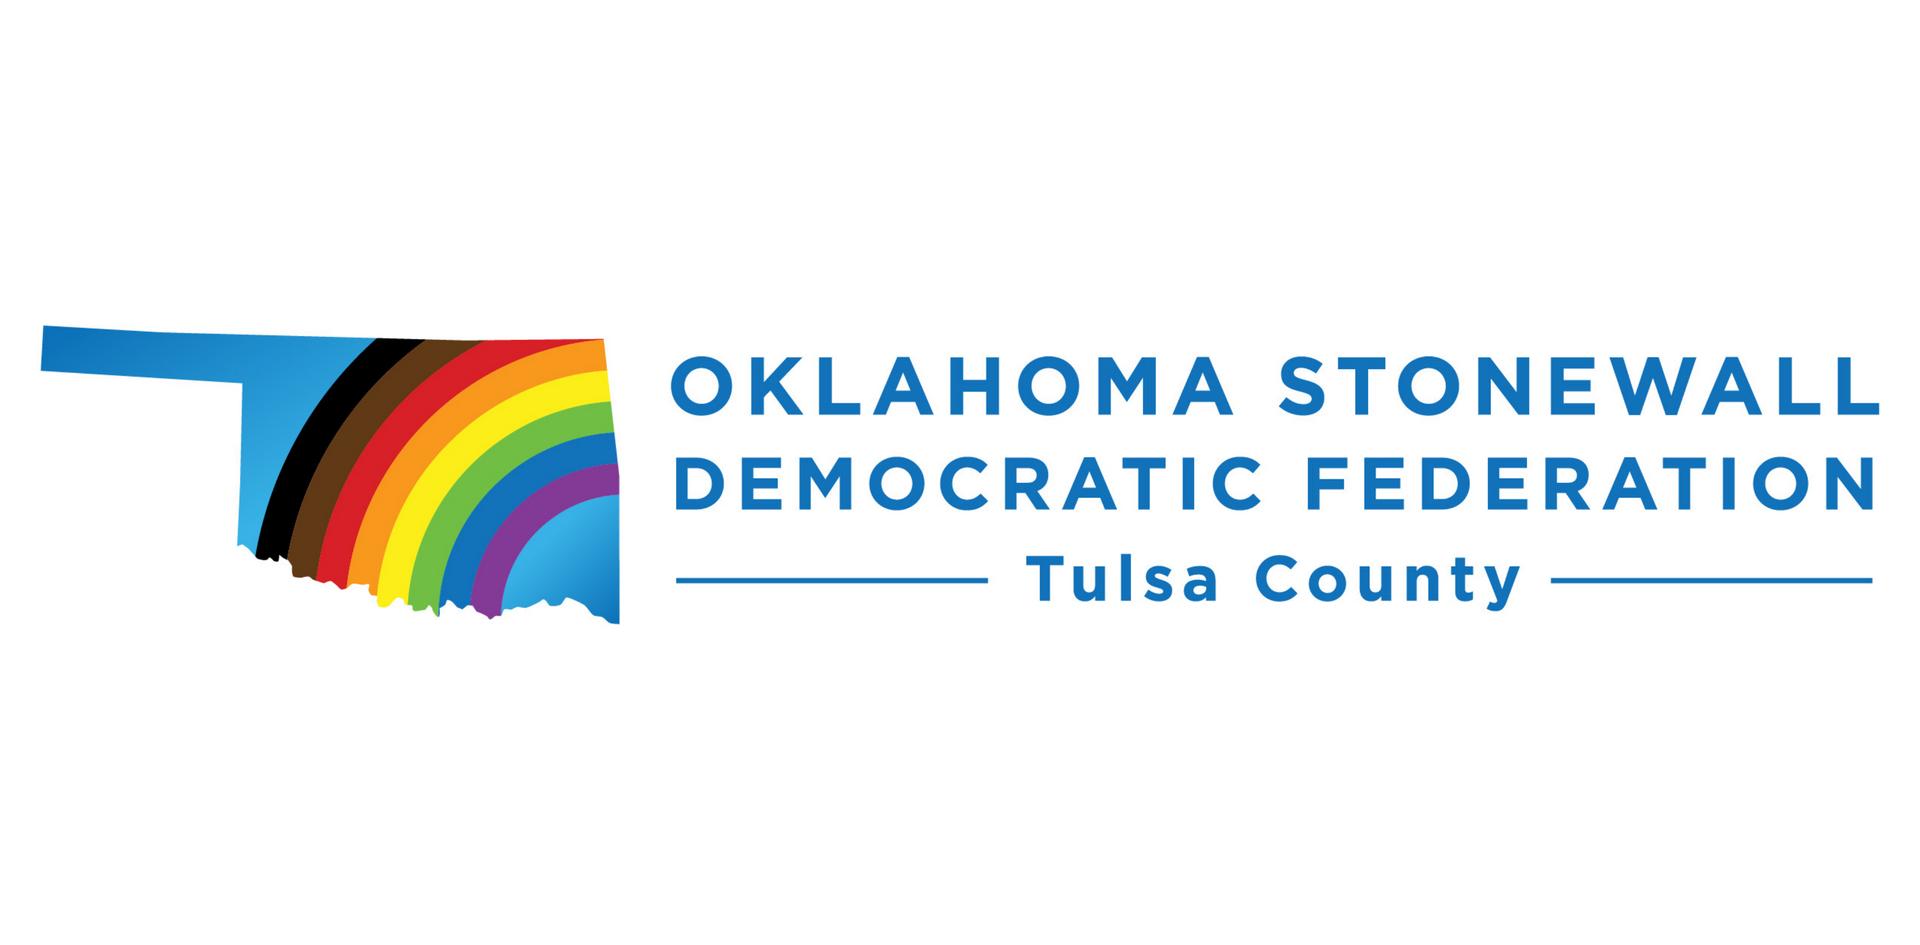 Oklahoma Stonewall Democratic Federation Tulsa County Facebook Page